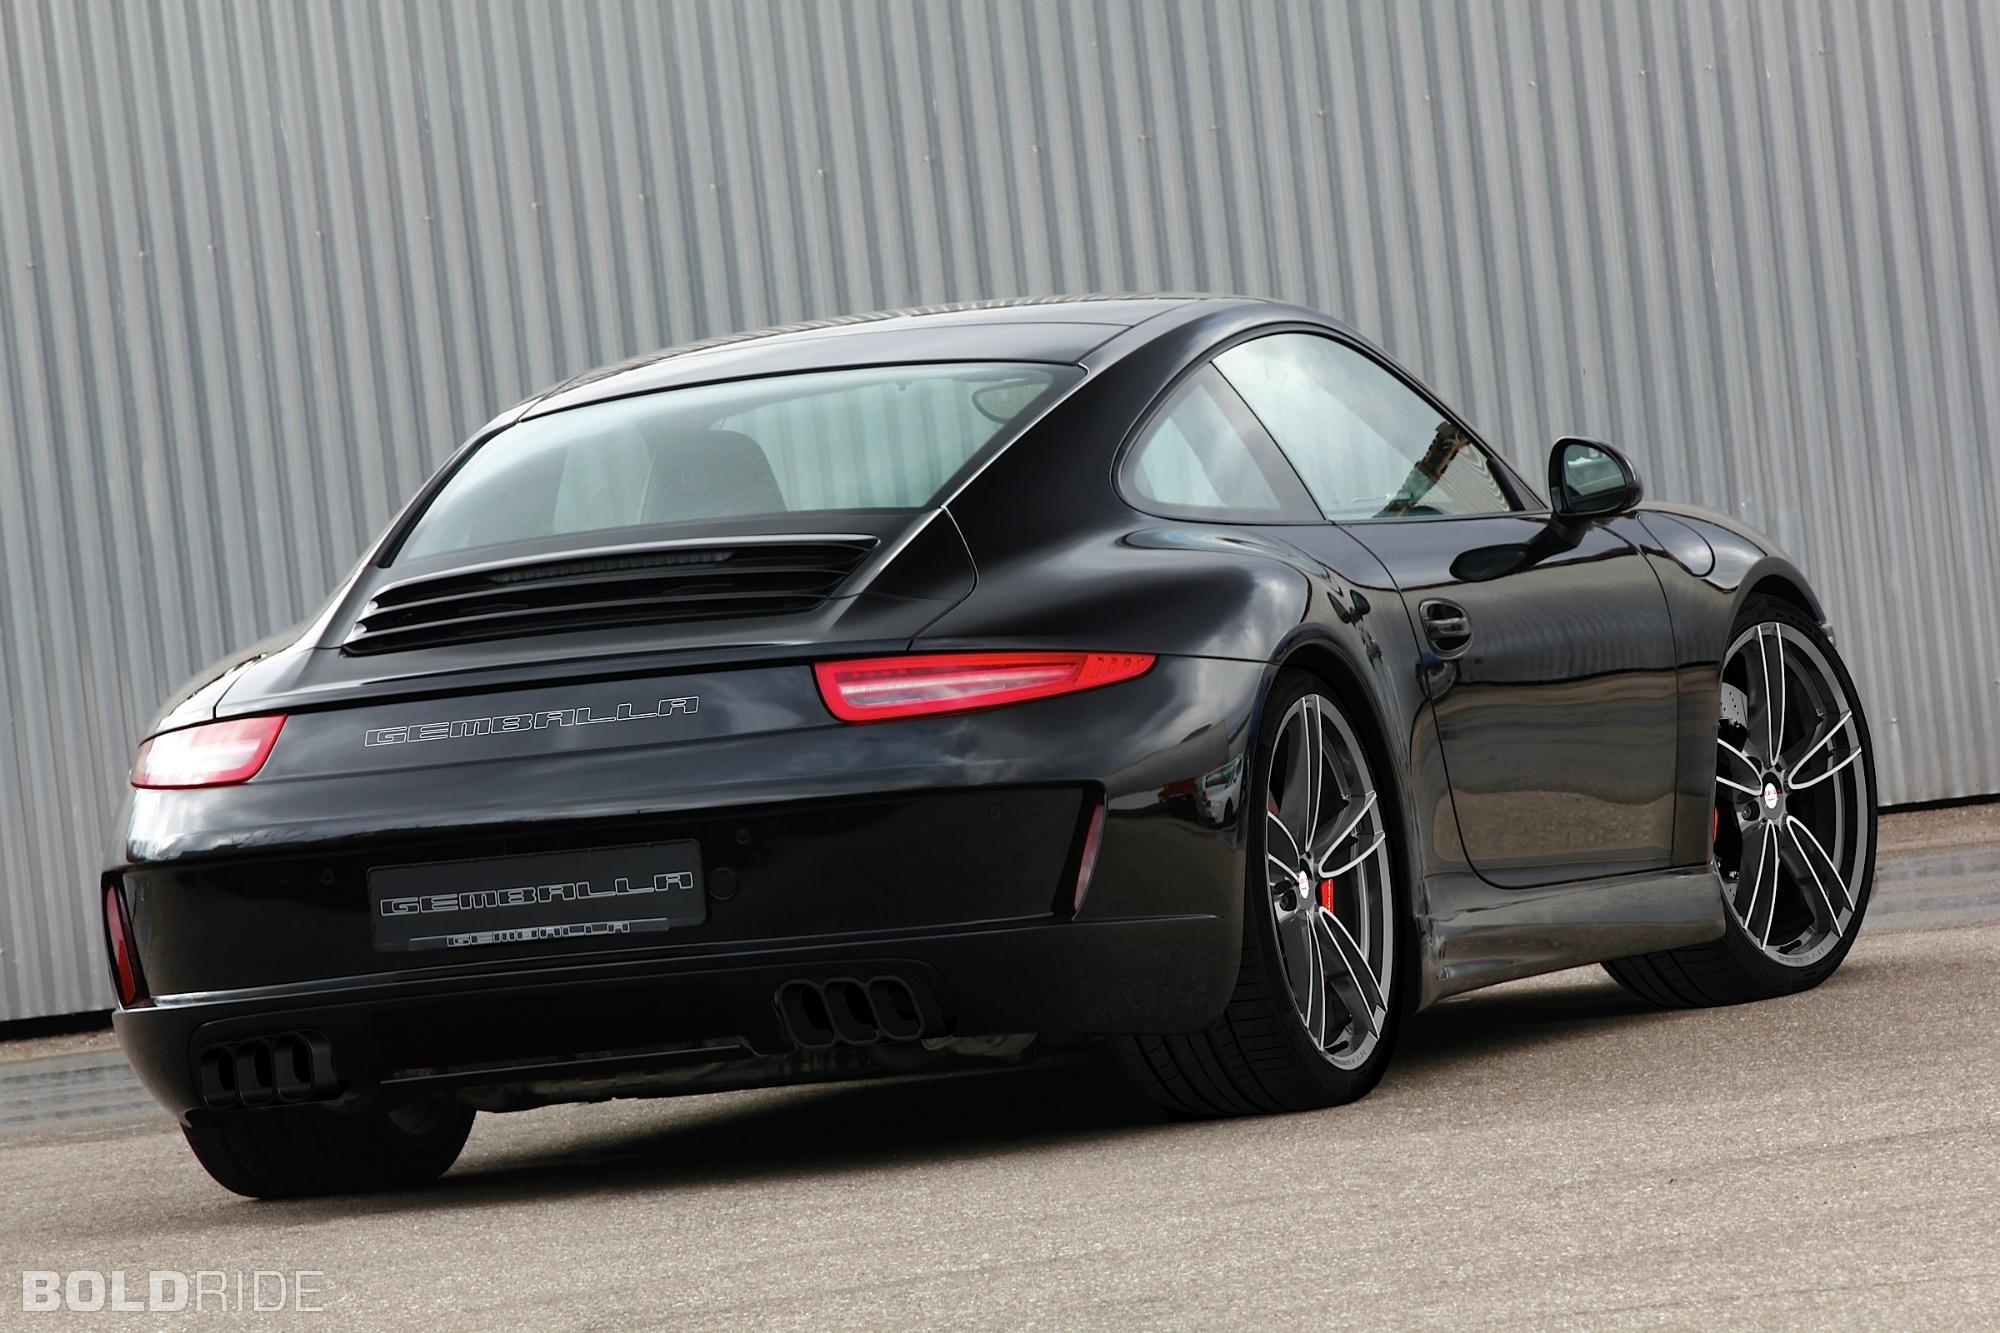 2012 Gemballa Porsche 911 1024 x 770